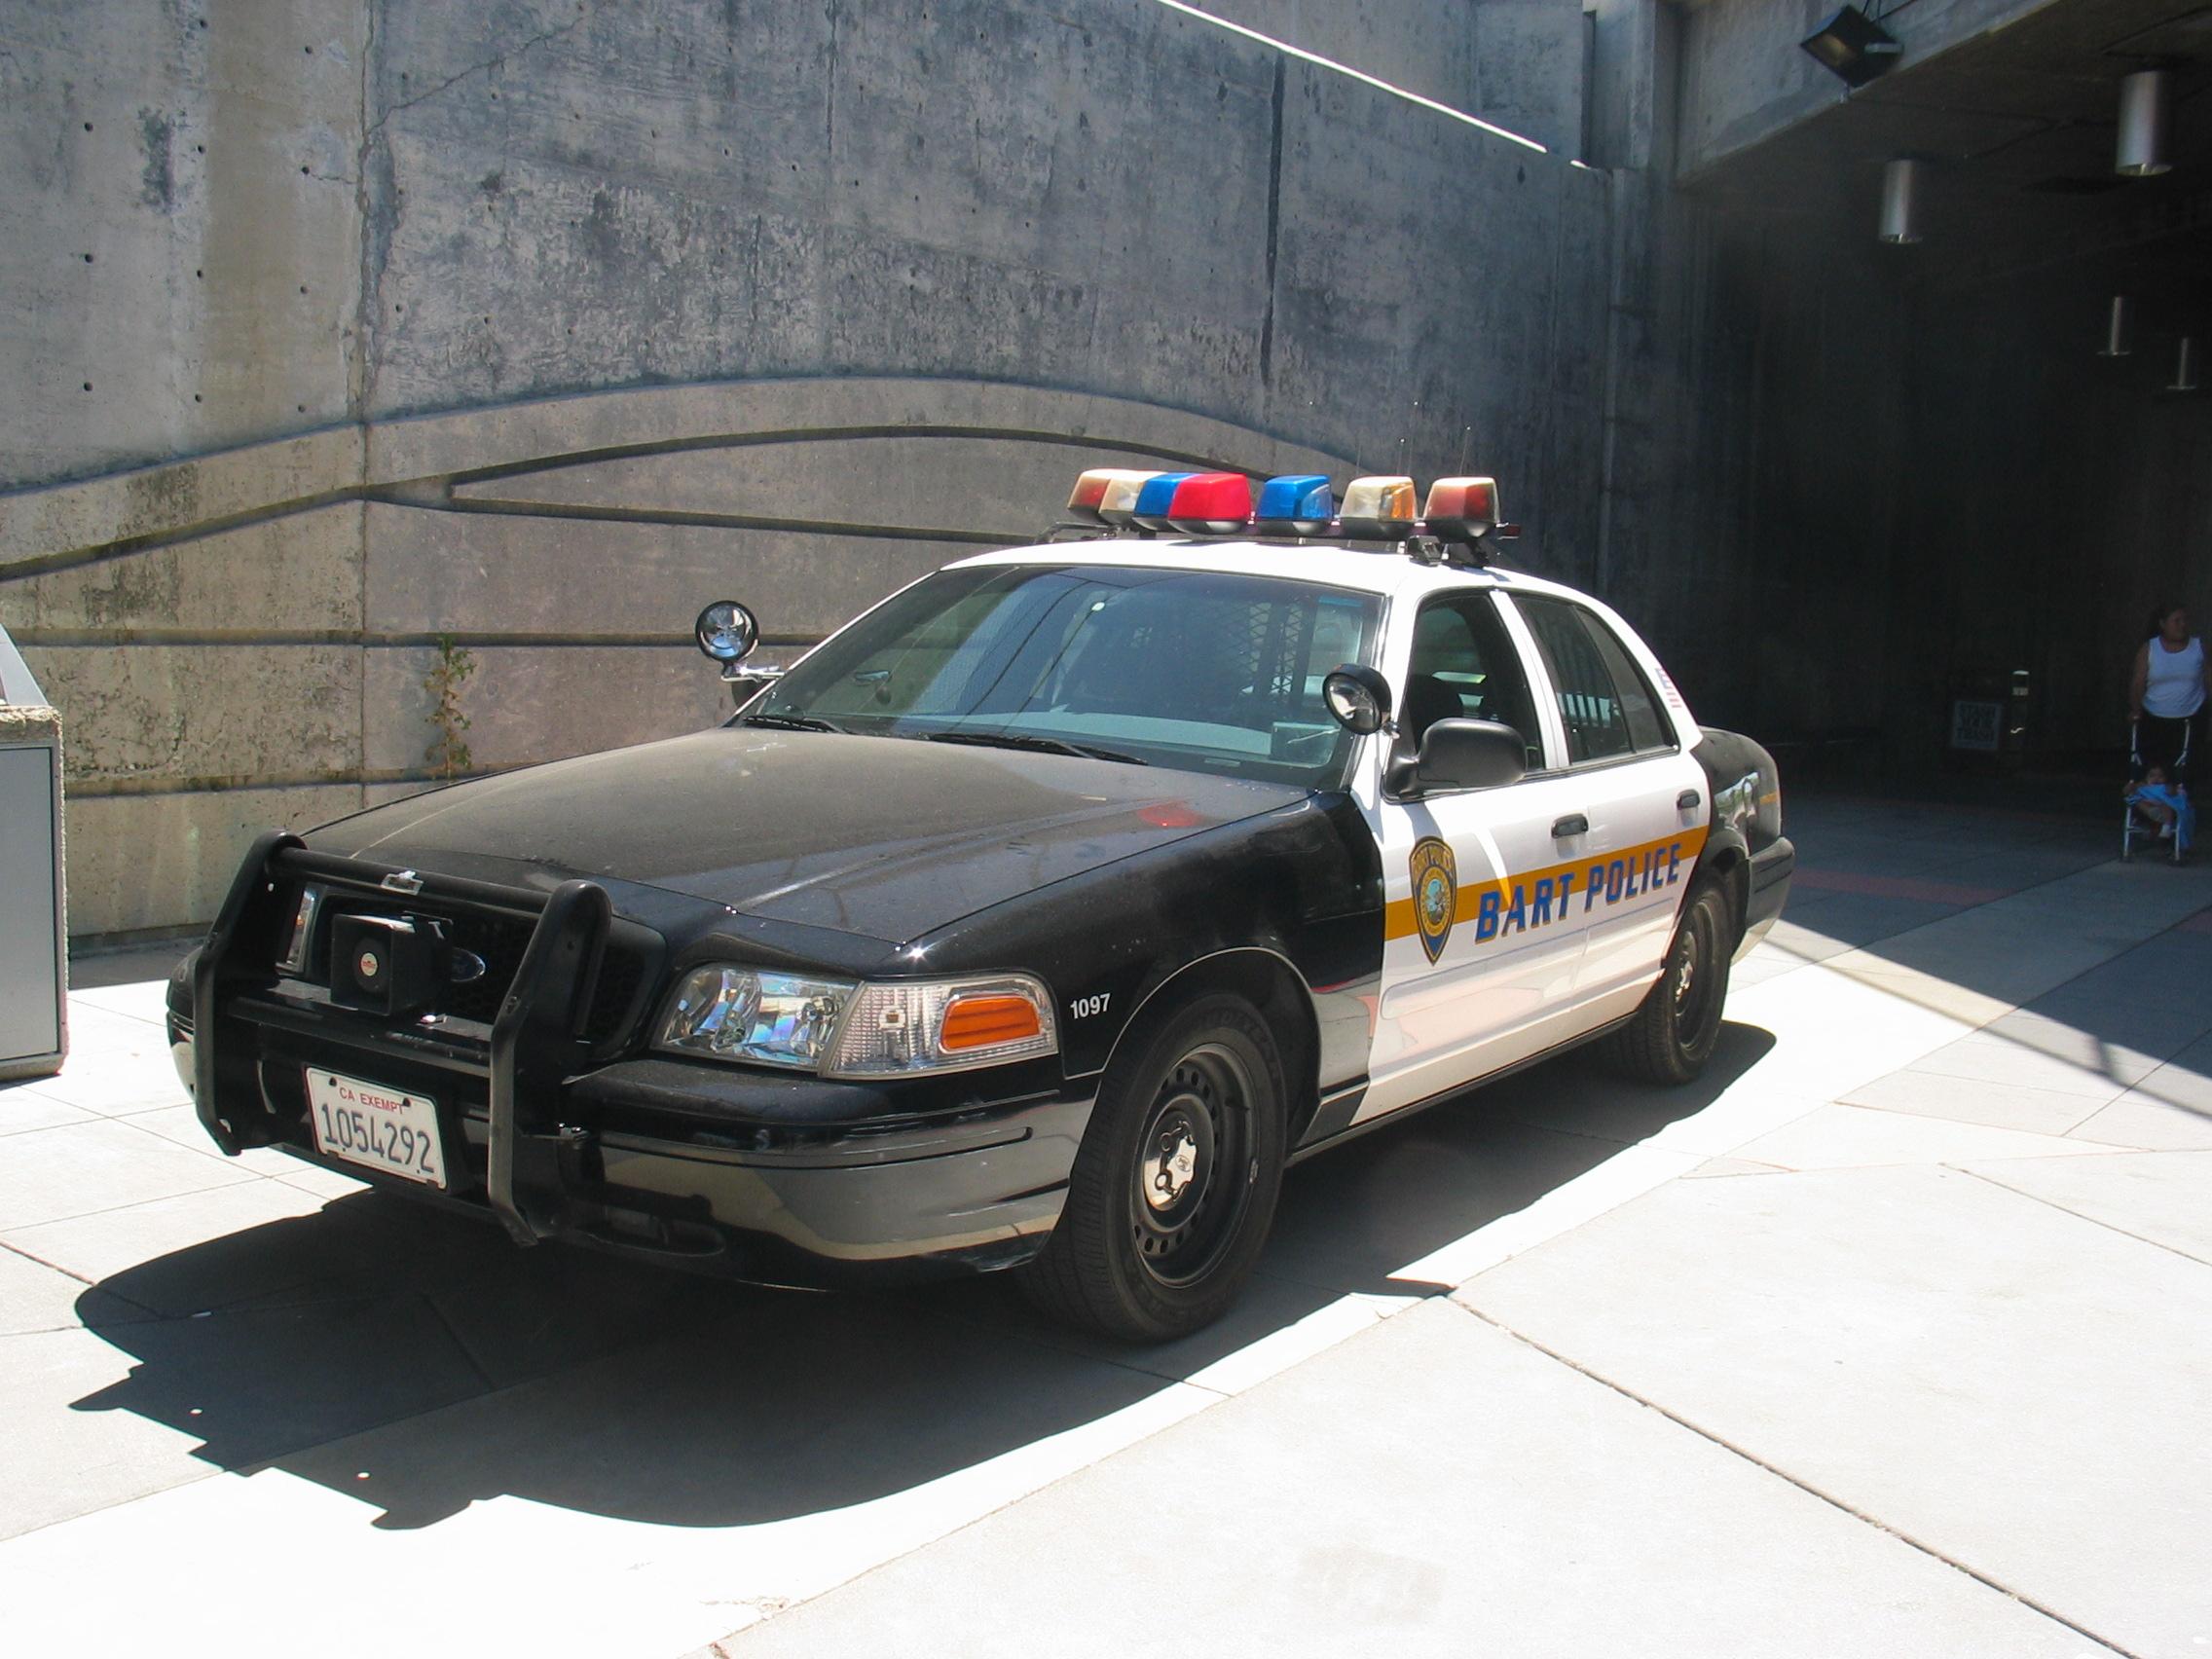 cop car pictures